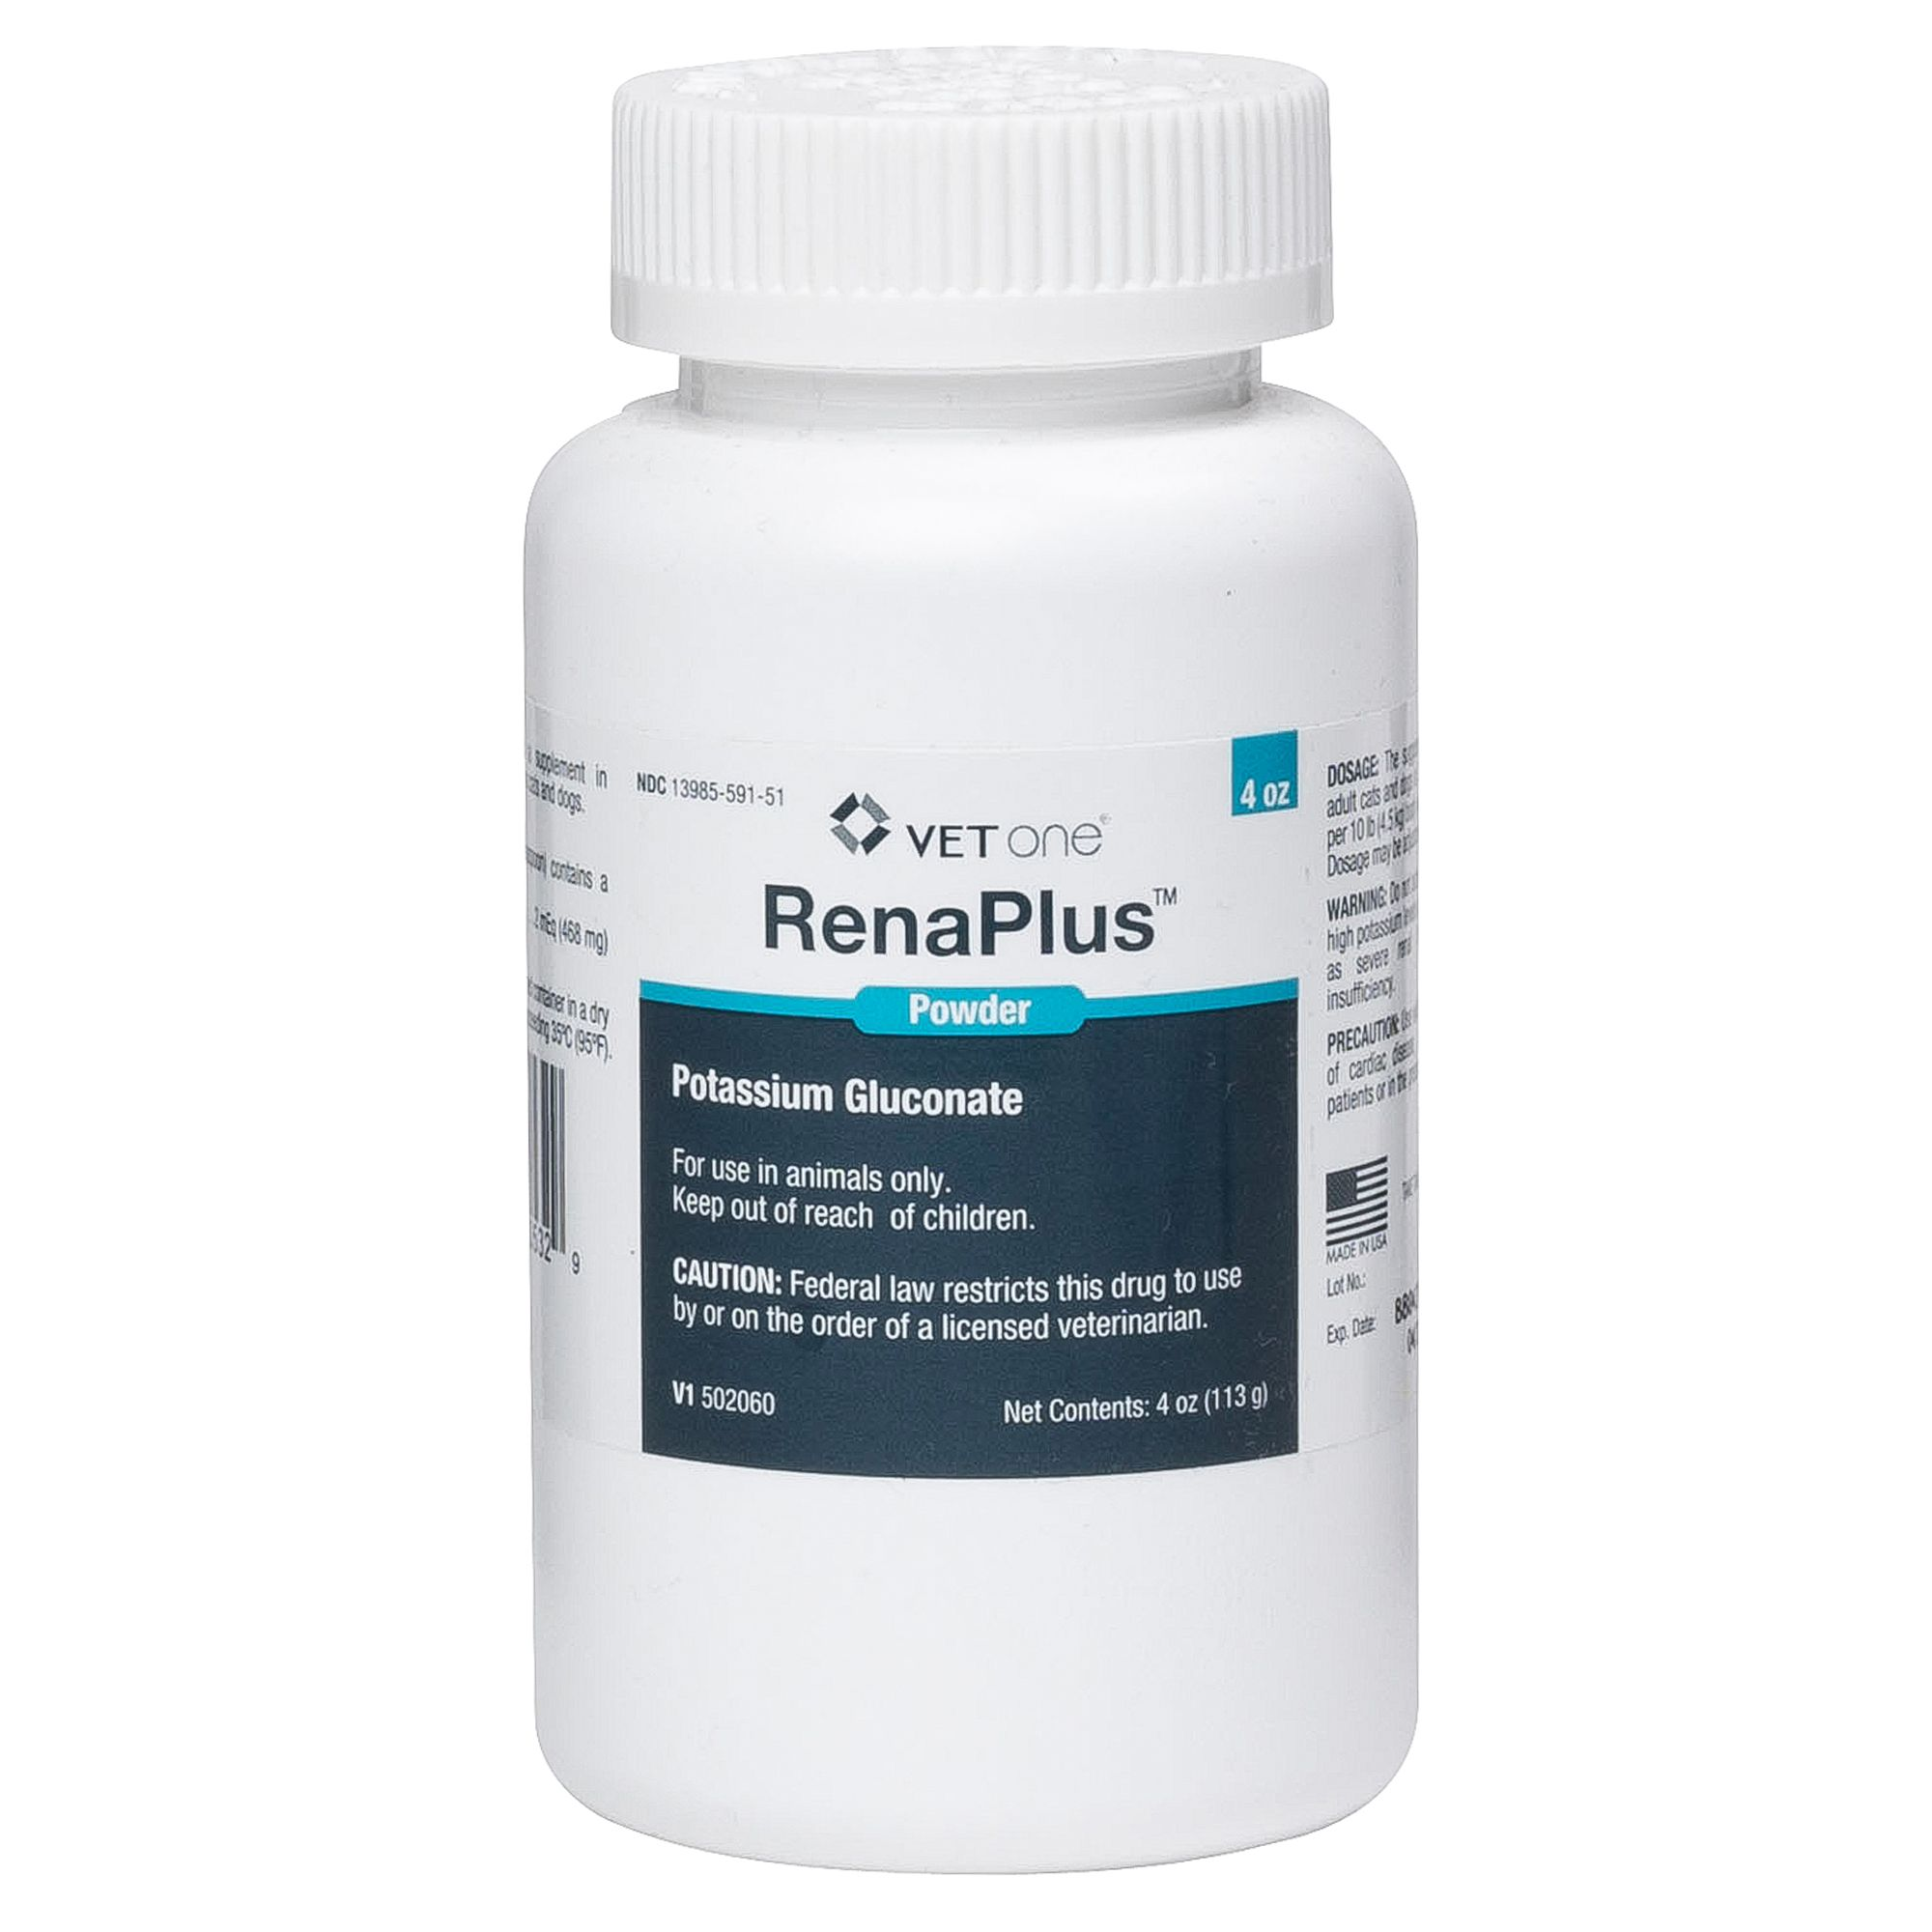 RenaPlus Powder size: 4 Oz